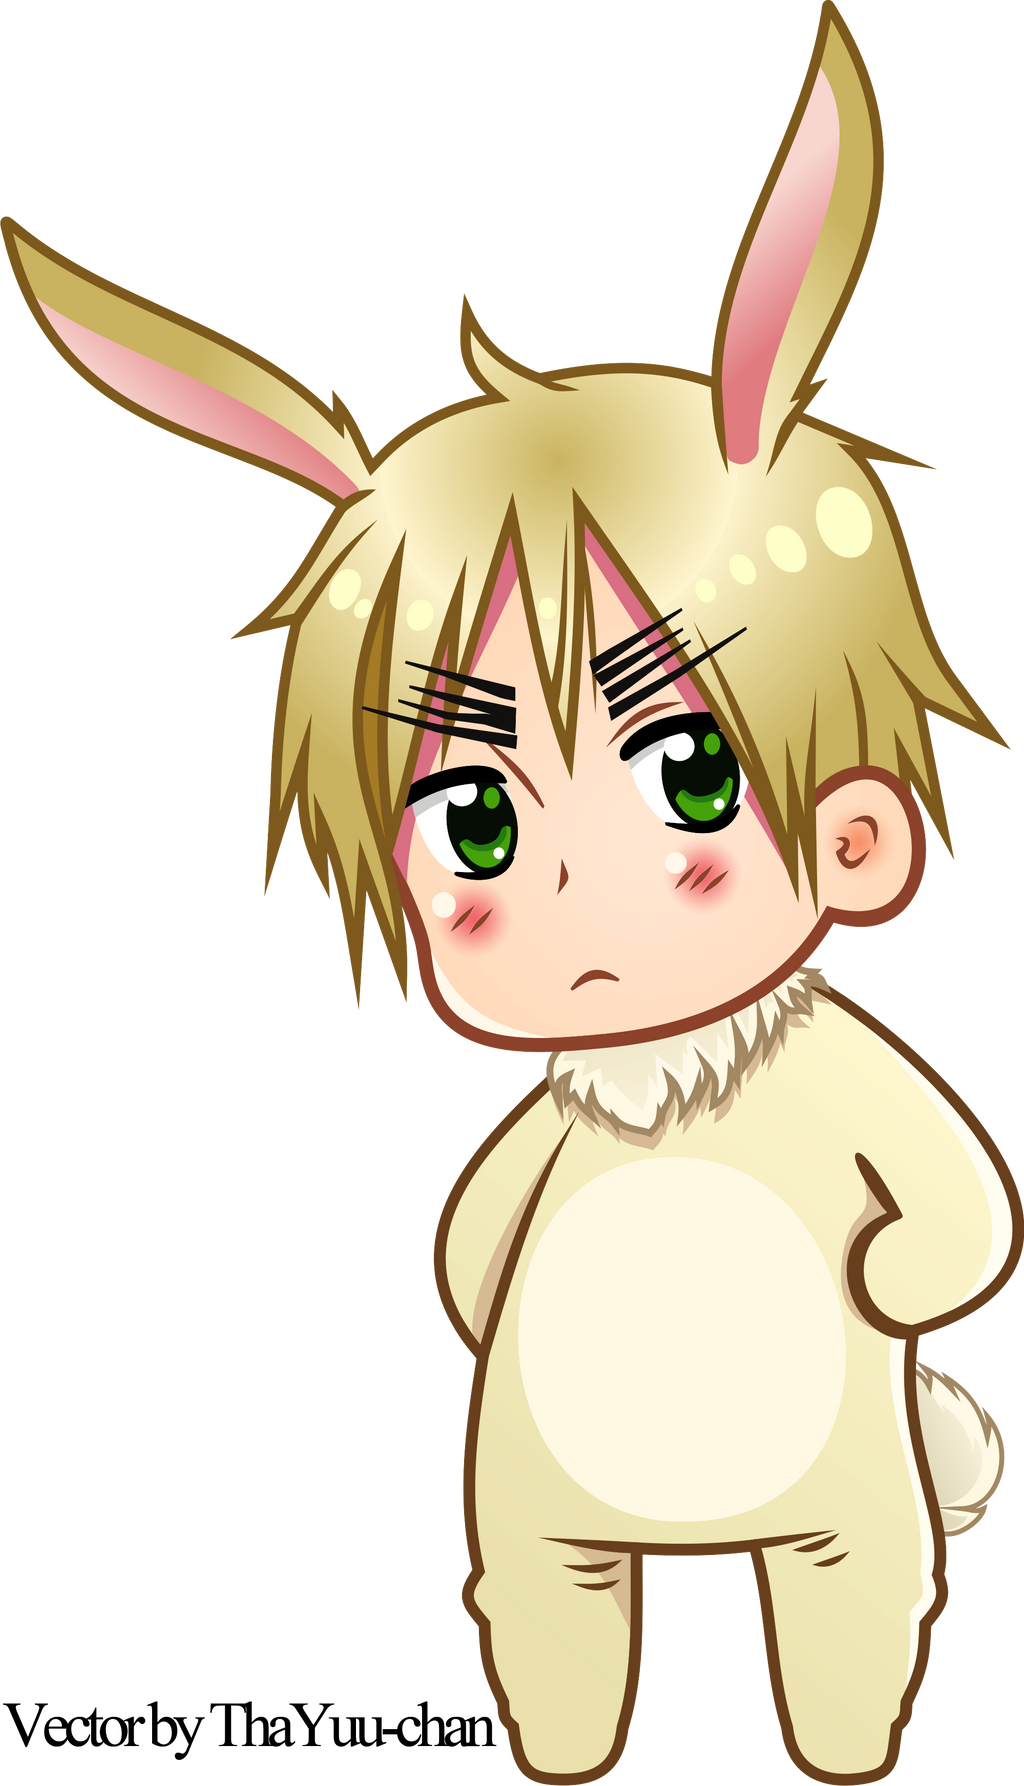 cute bunny wallpaper